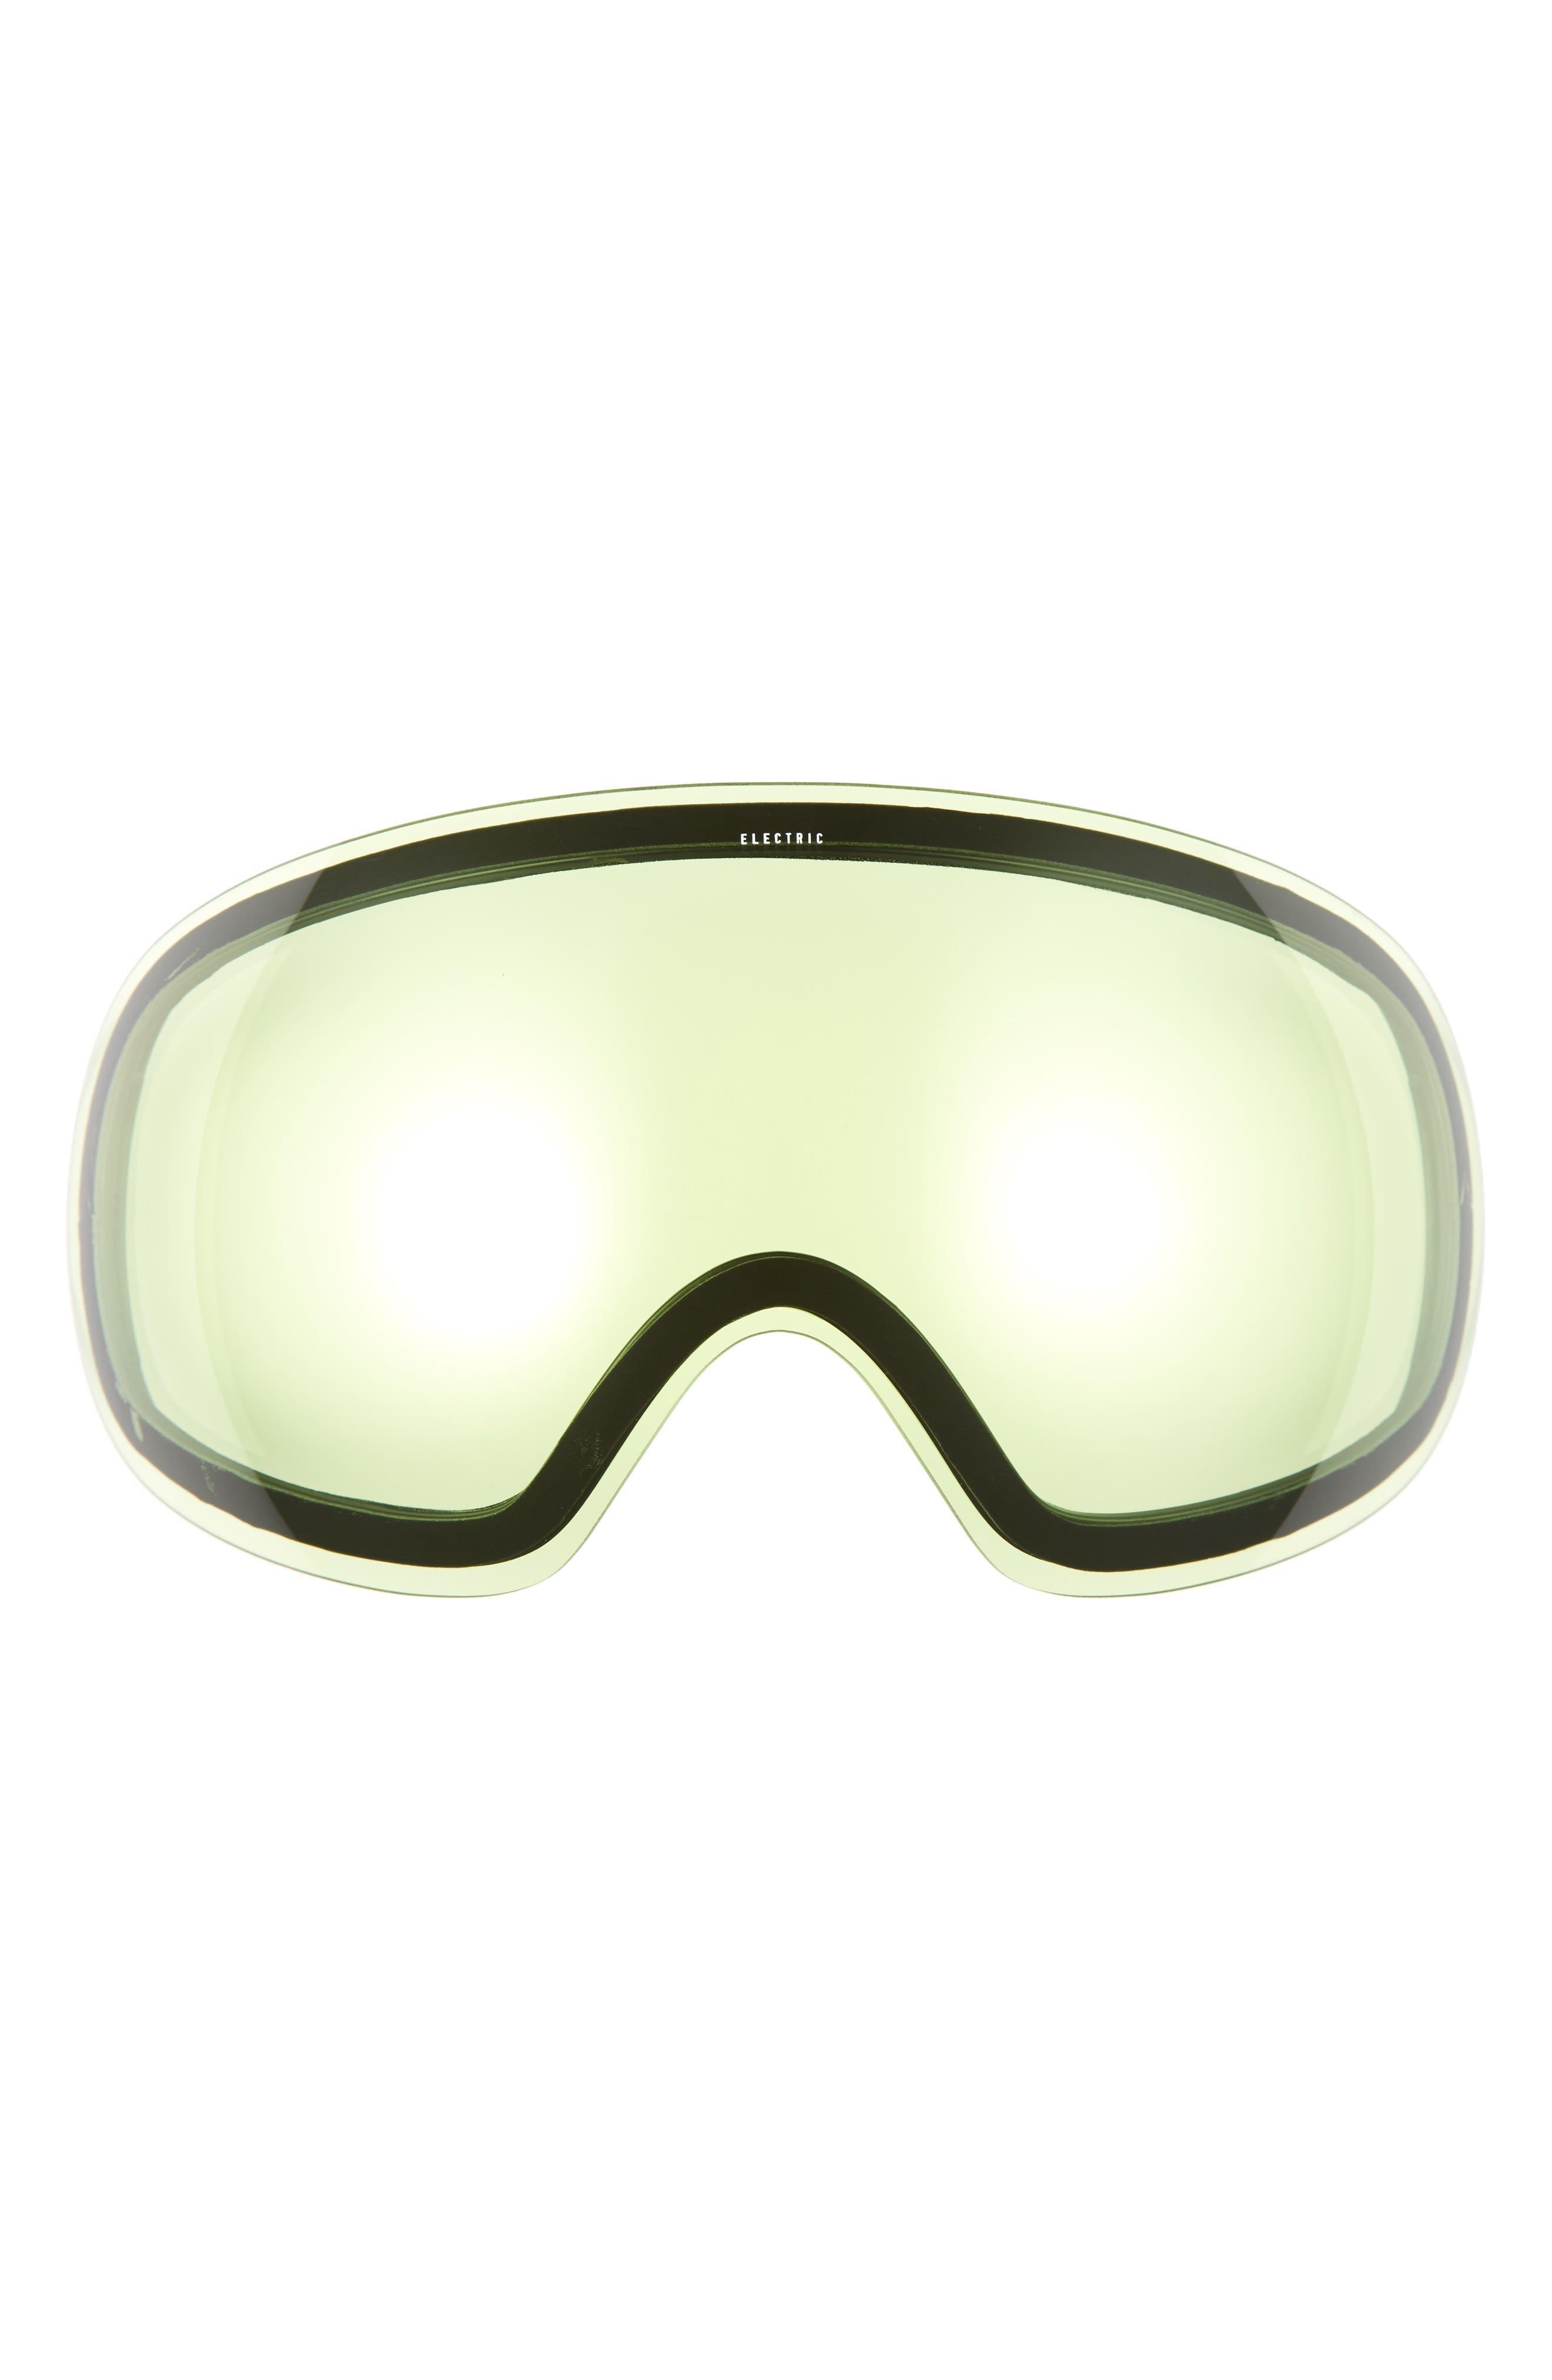 EG3 254mm Snow Goggles,                             Alternate thumbnail 42, color,